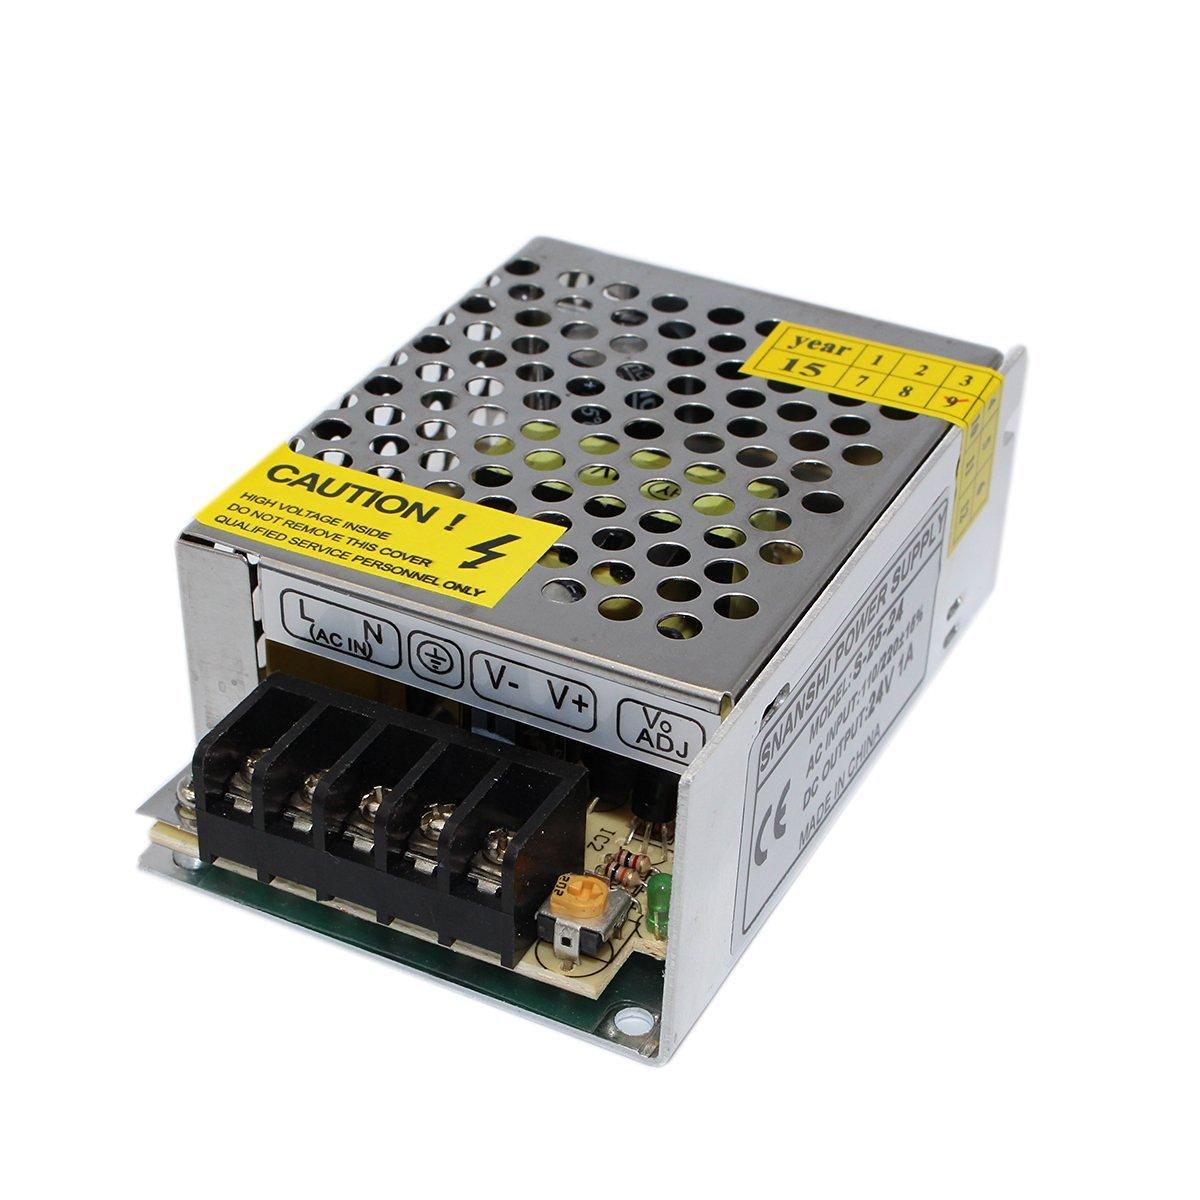 SNANSHI 24V 1A 25W LED Switching Power Supply Transformer 110V 220V AC to DC 24V output, for LED Strip Light for CCTV